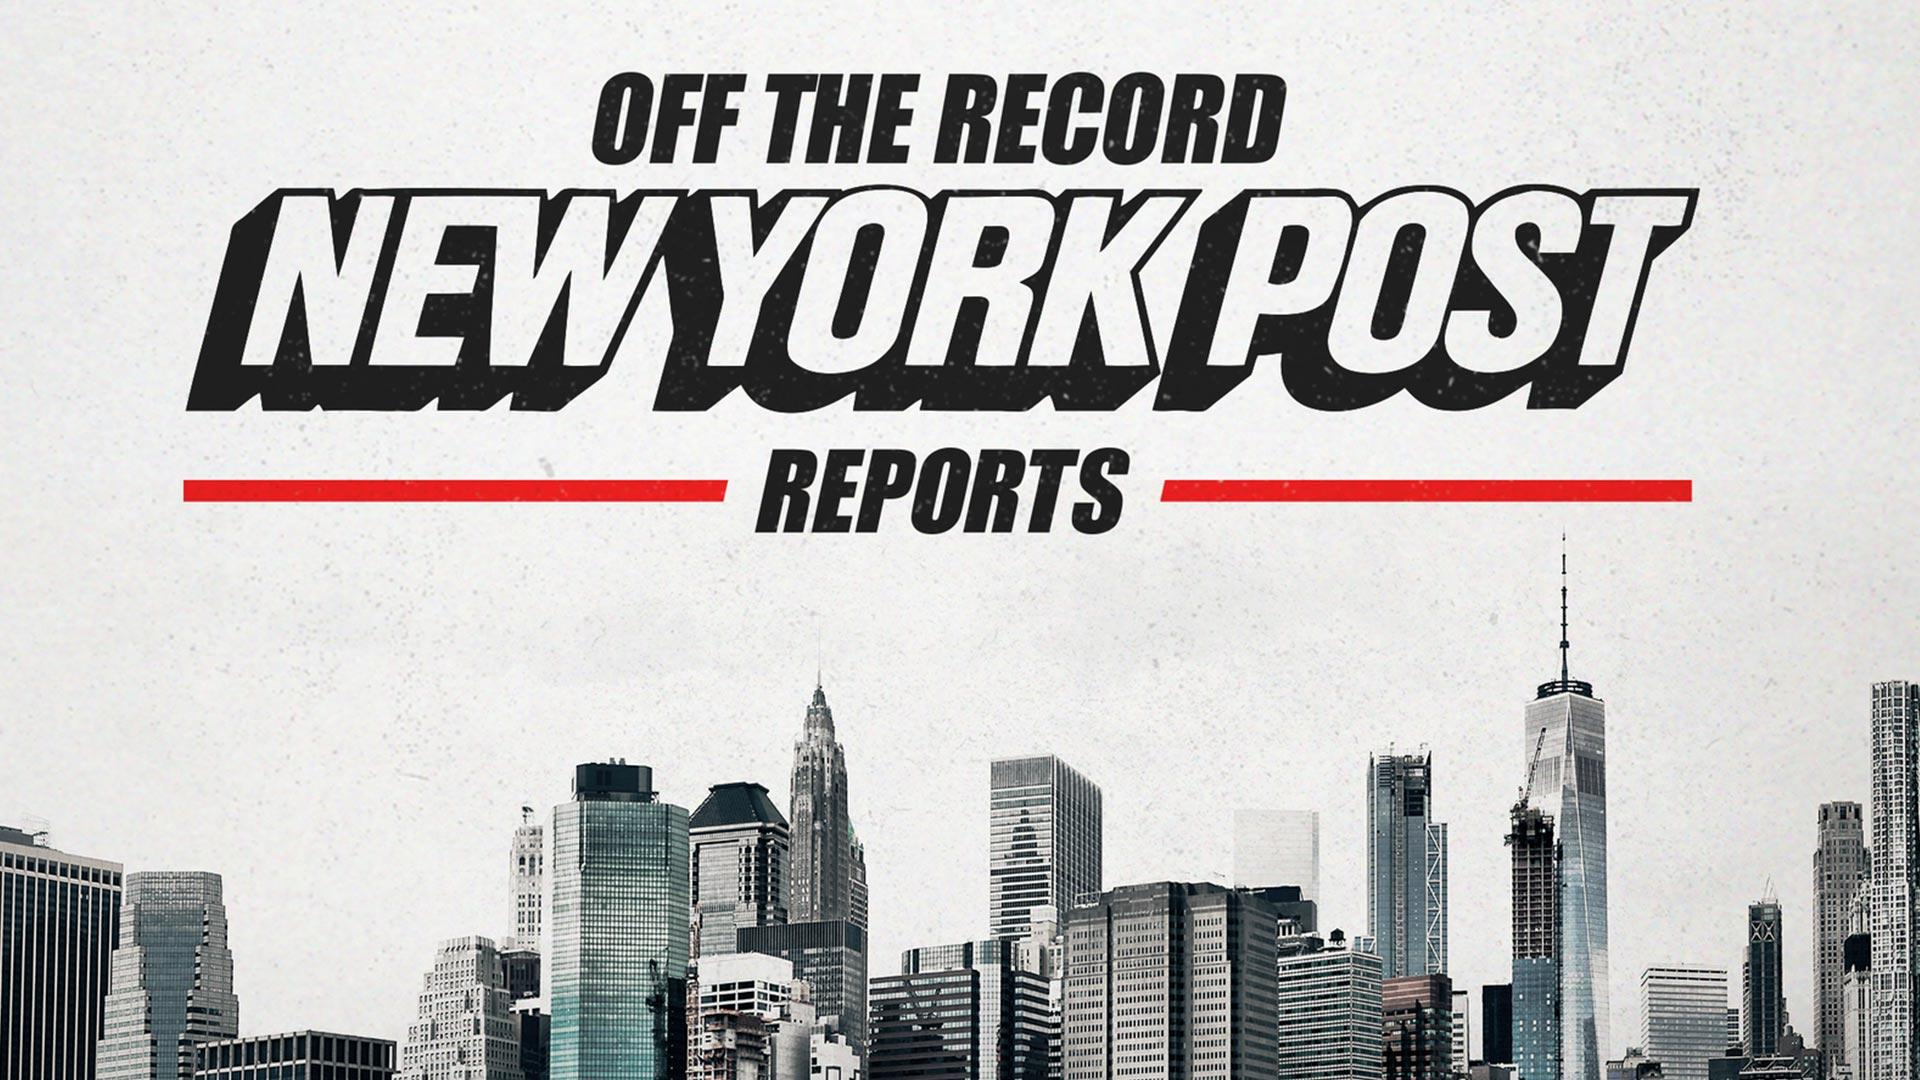 New York Post Reports: Off the Record - Season 1